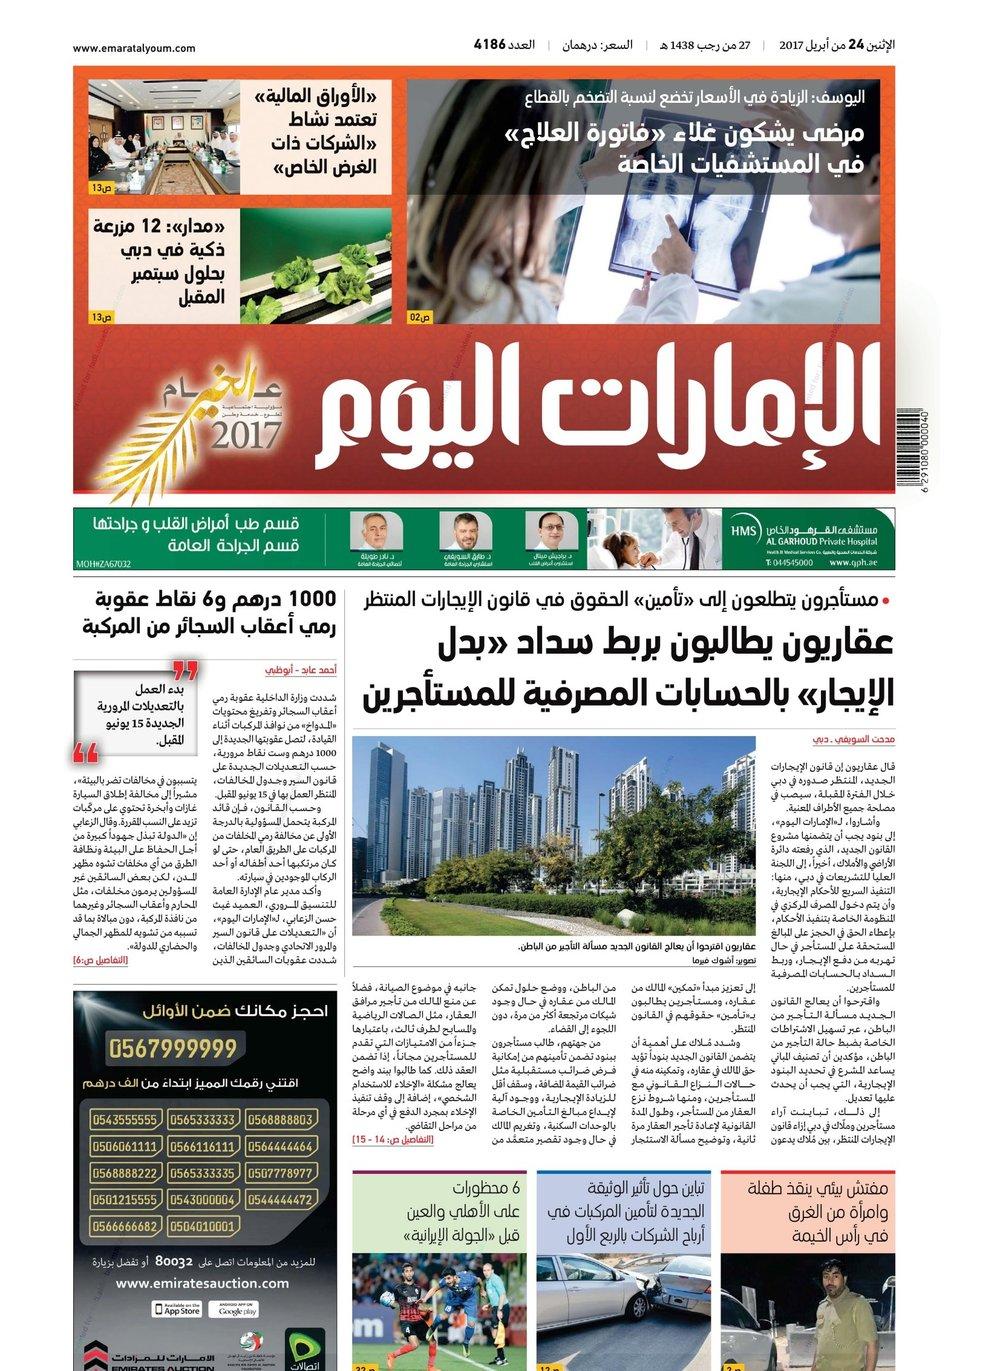 EmiratesToday Front Page - 24 April 2017.jpg